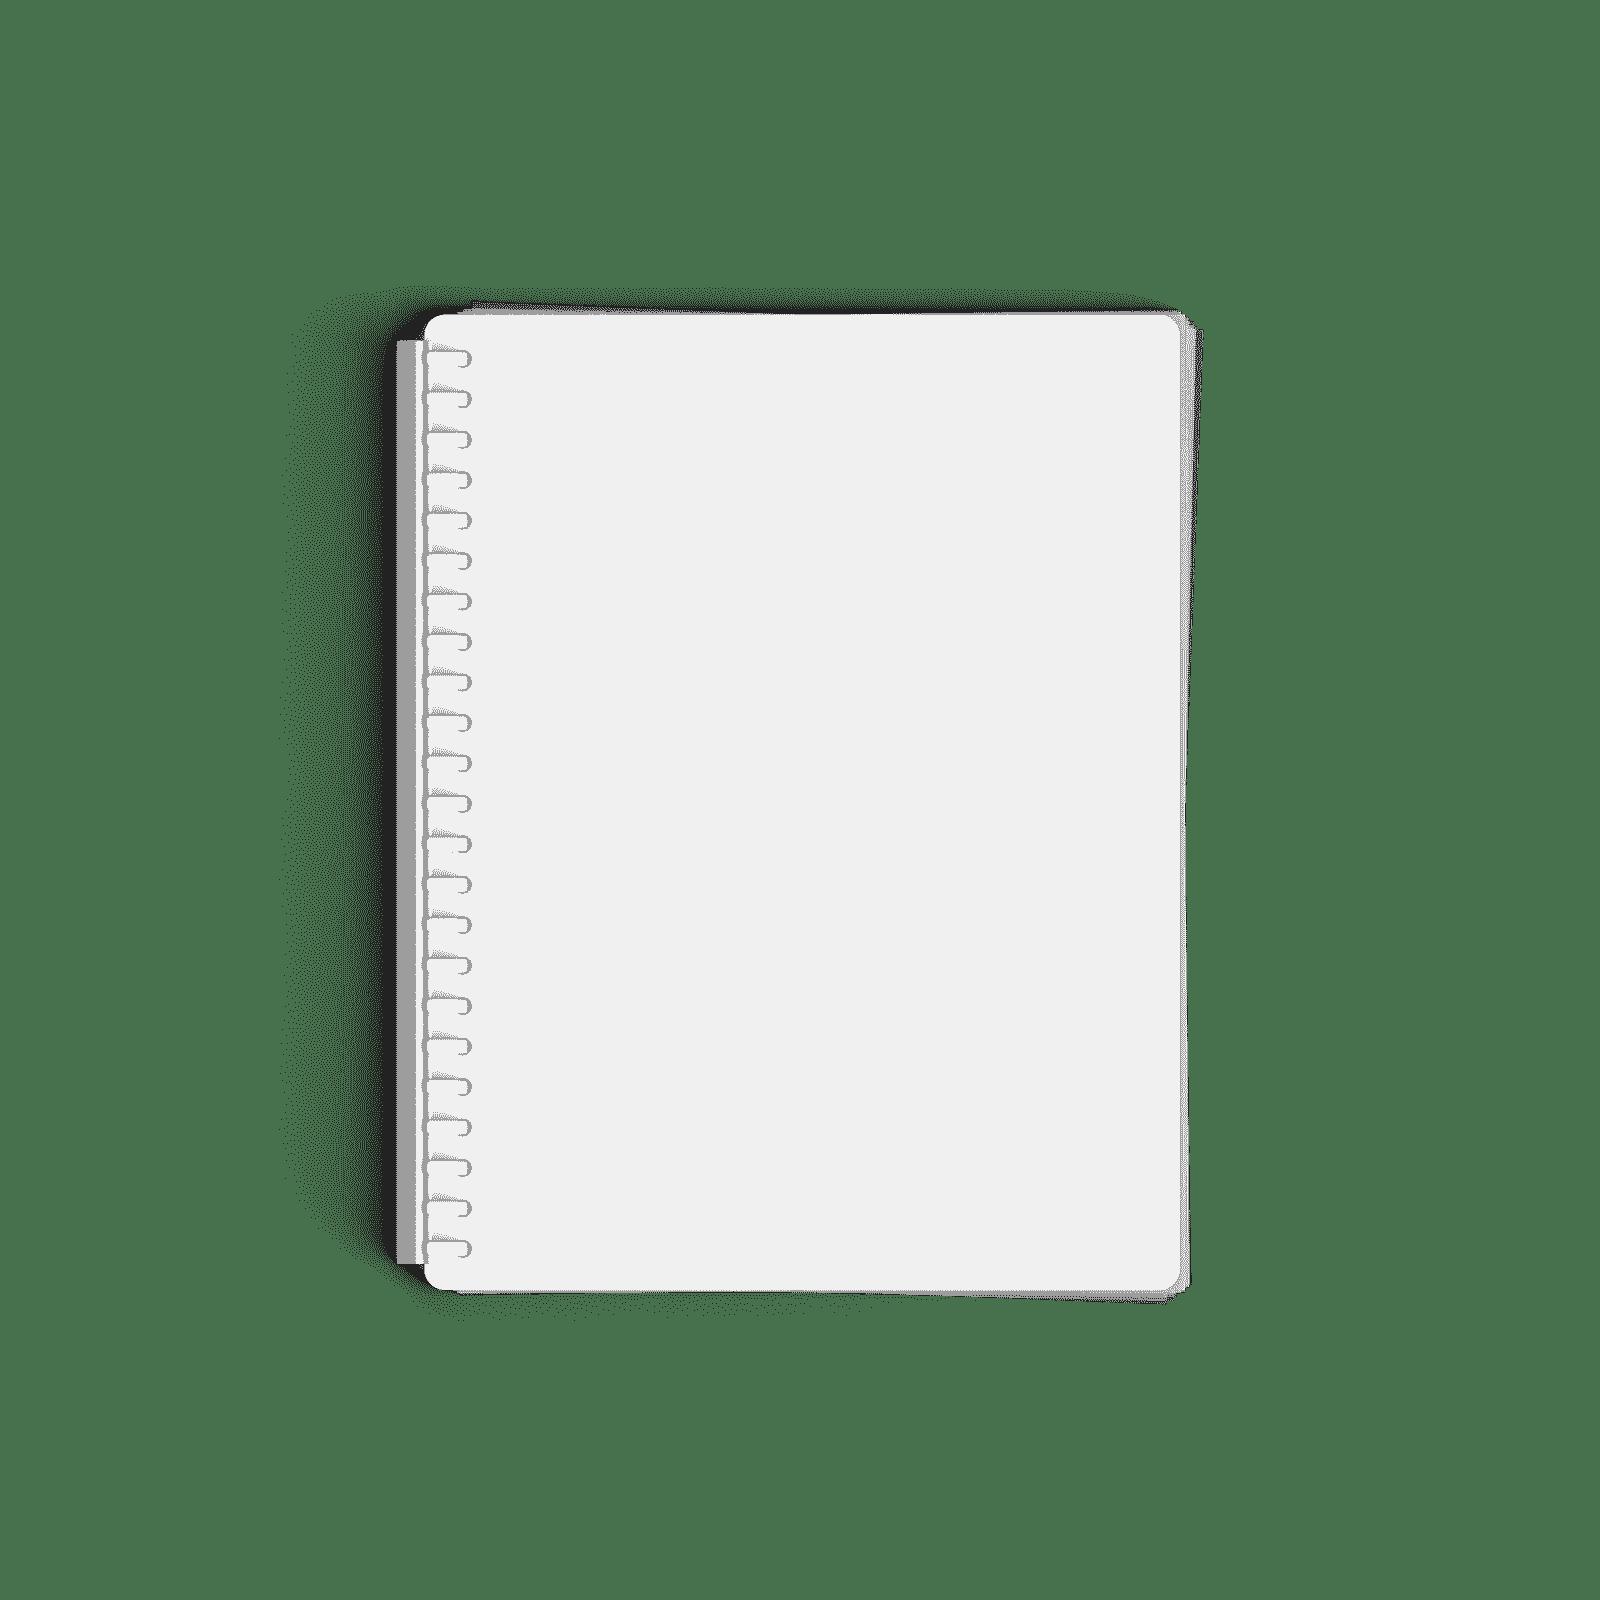 qommon marketing communicatie boekje